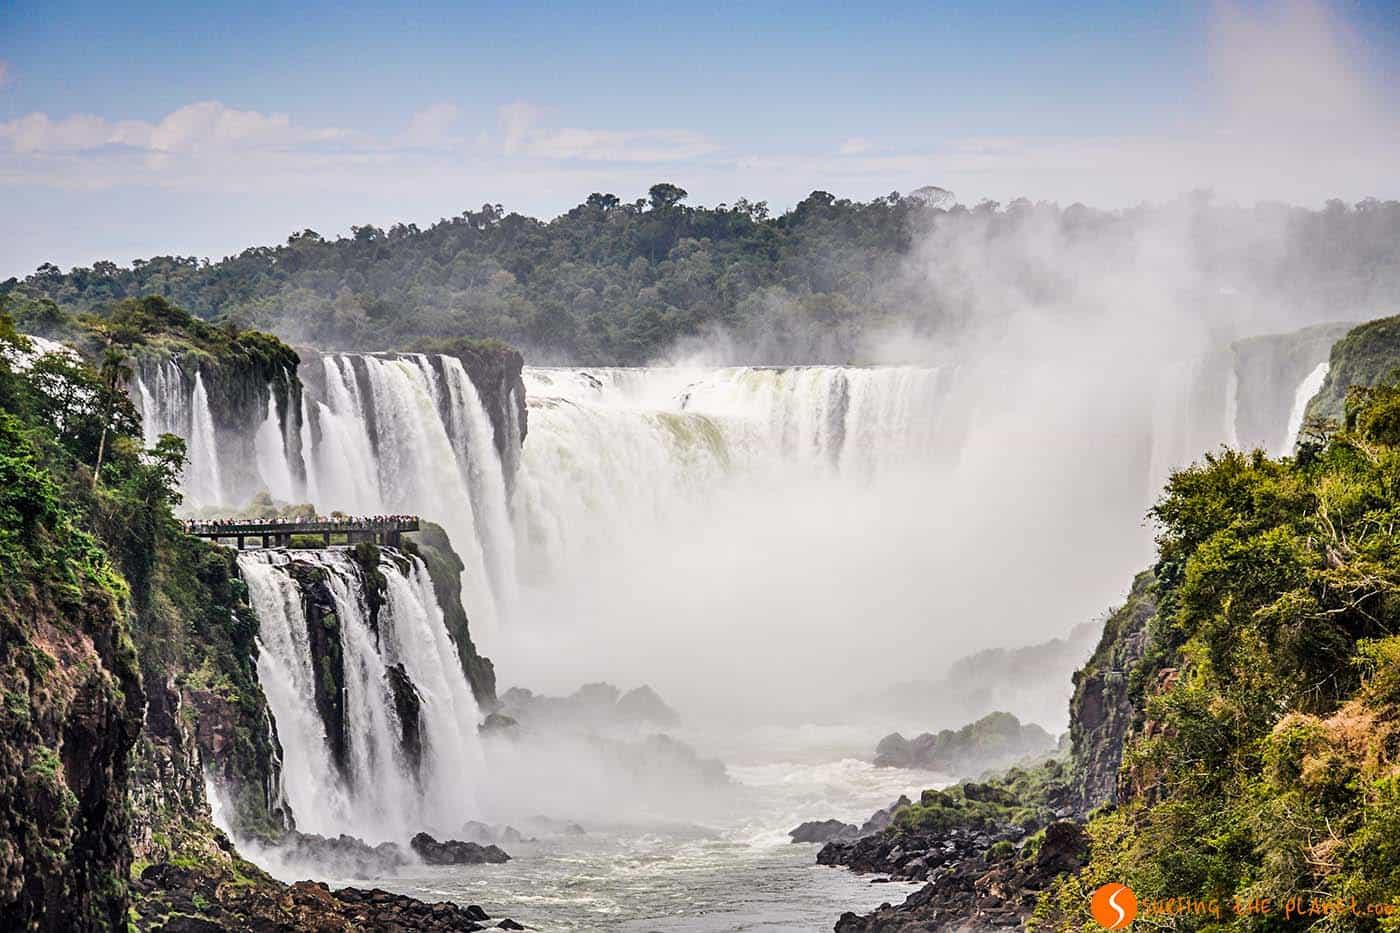 Le cascate più belle - cascate di iguazù